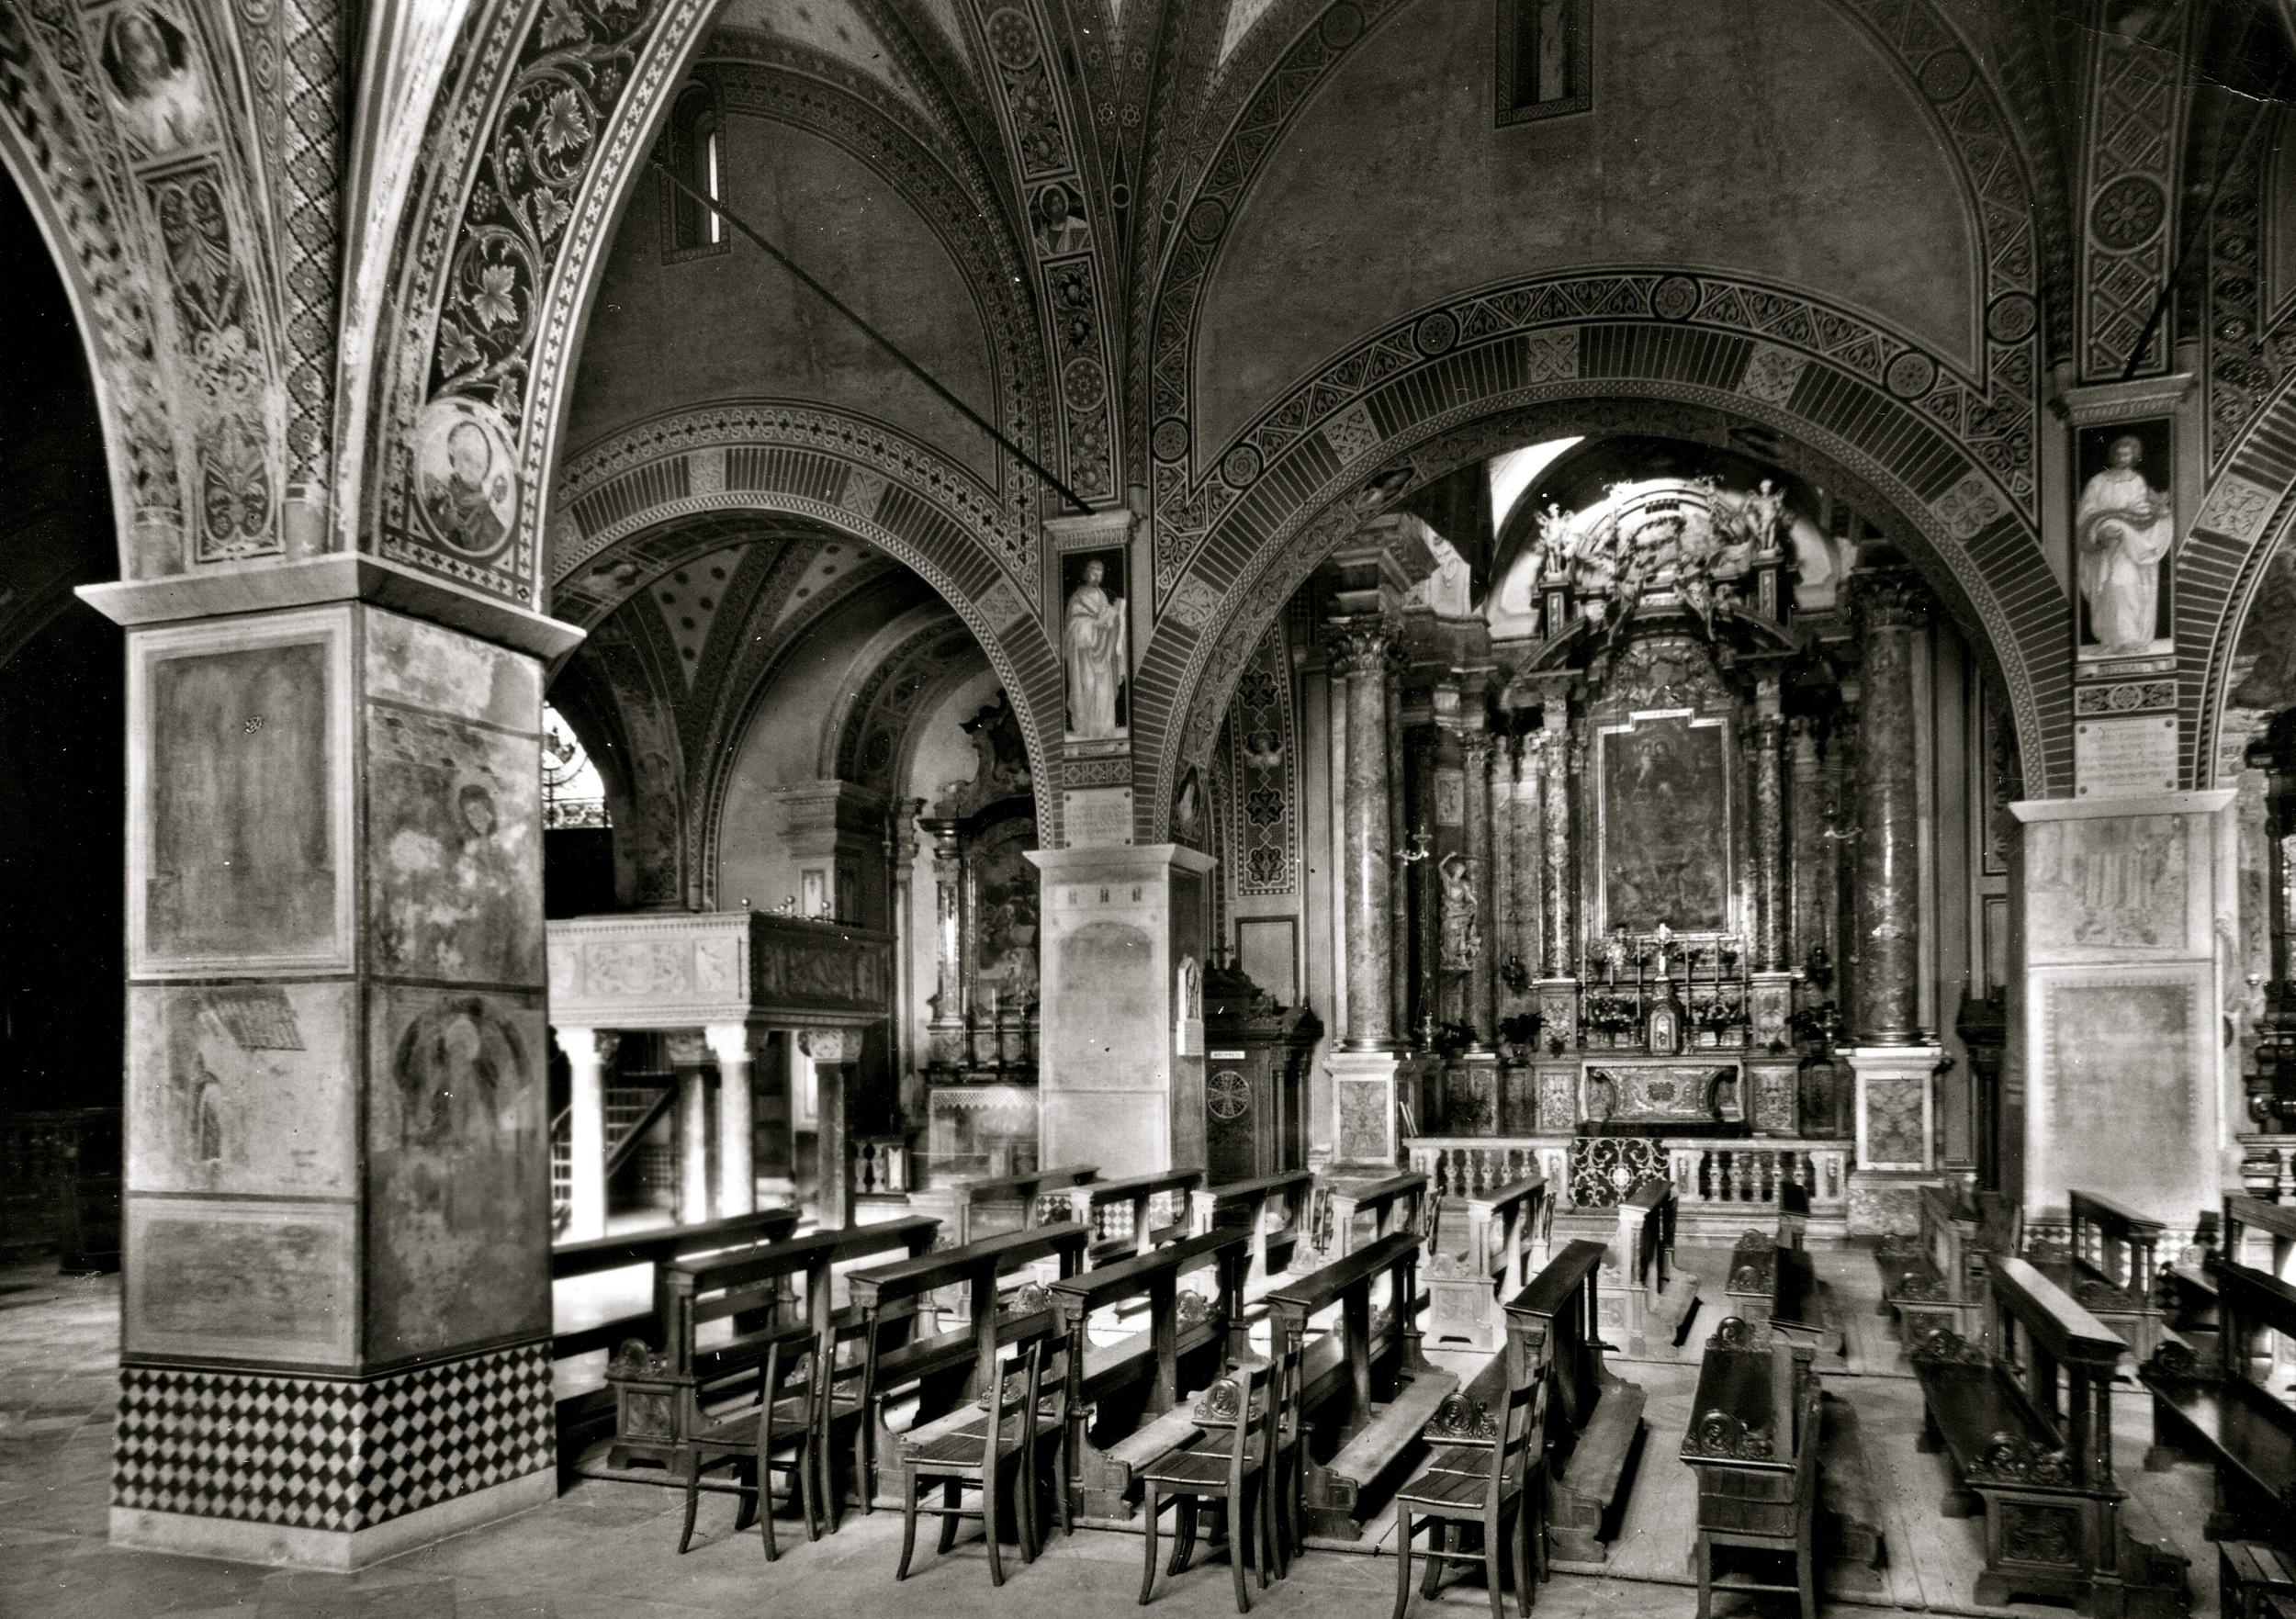 Lugano Cathedral